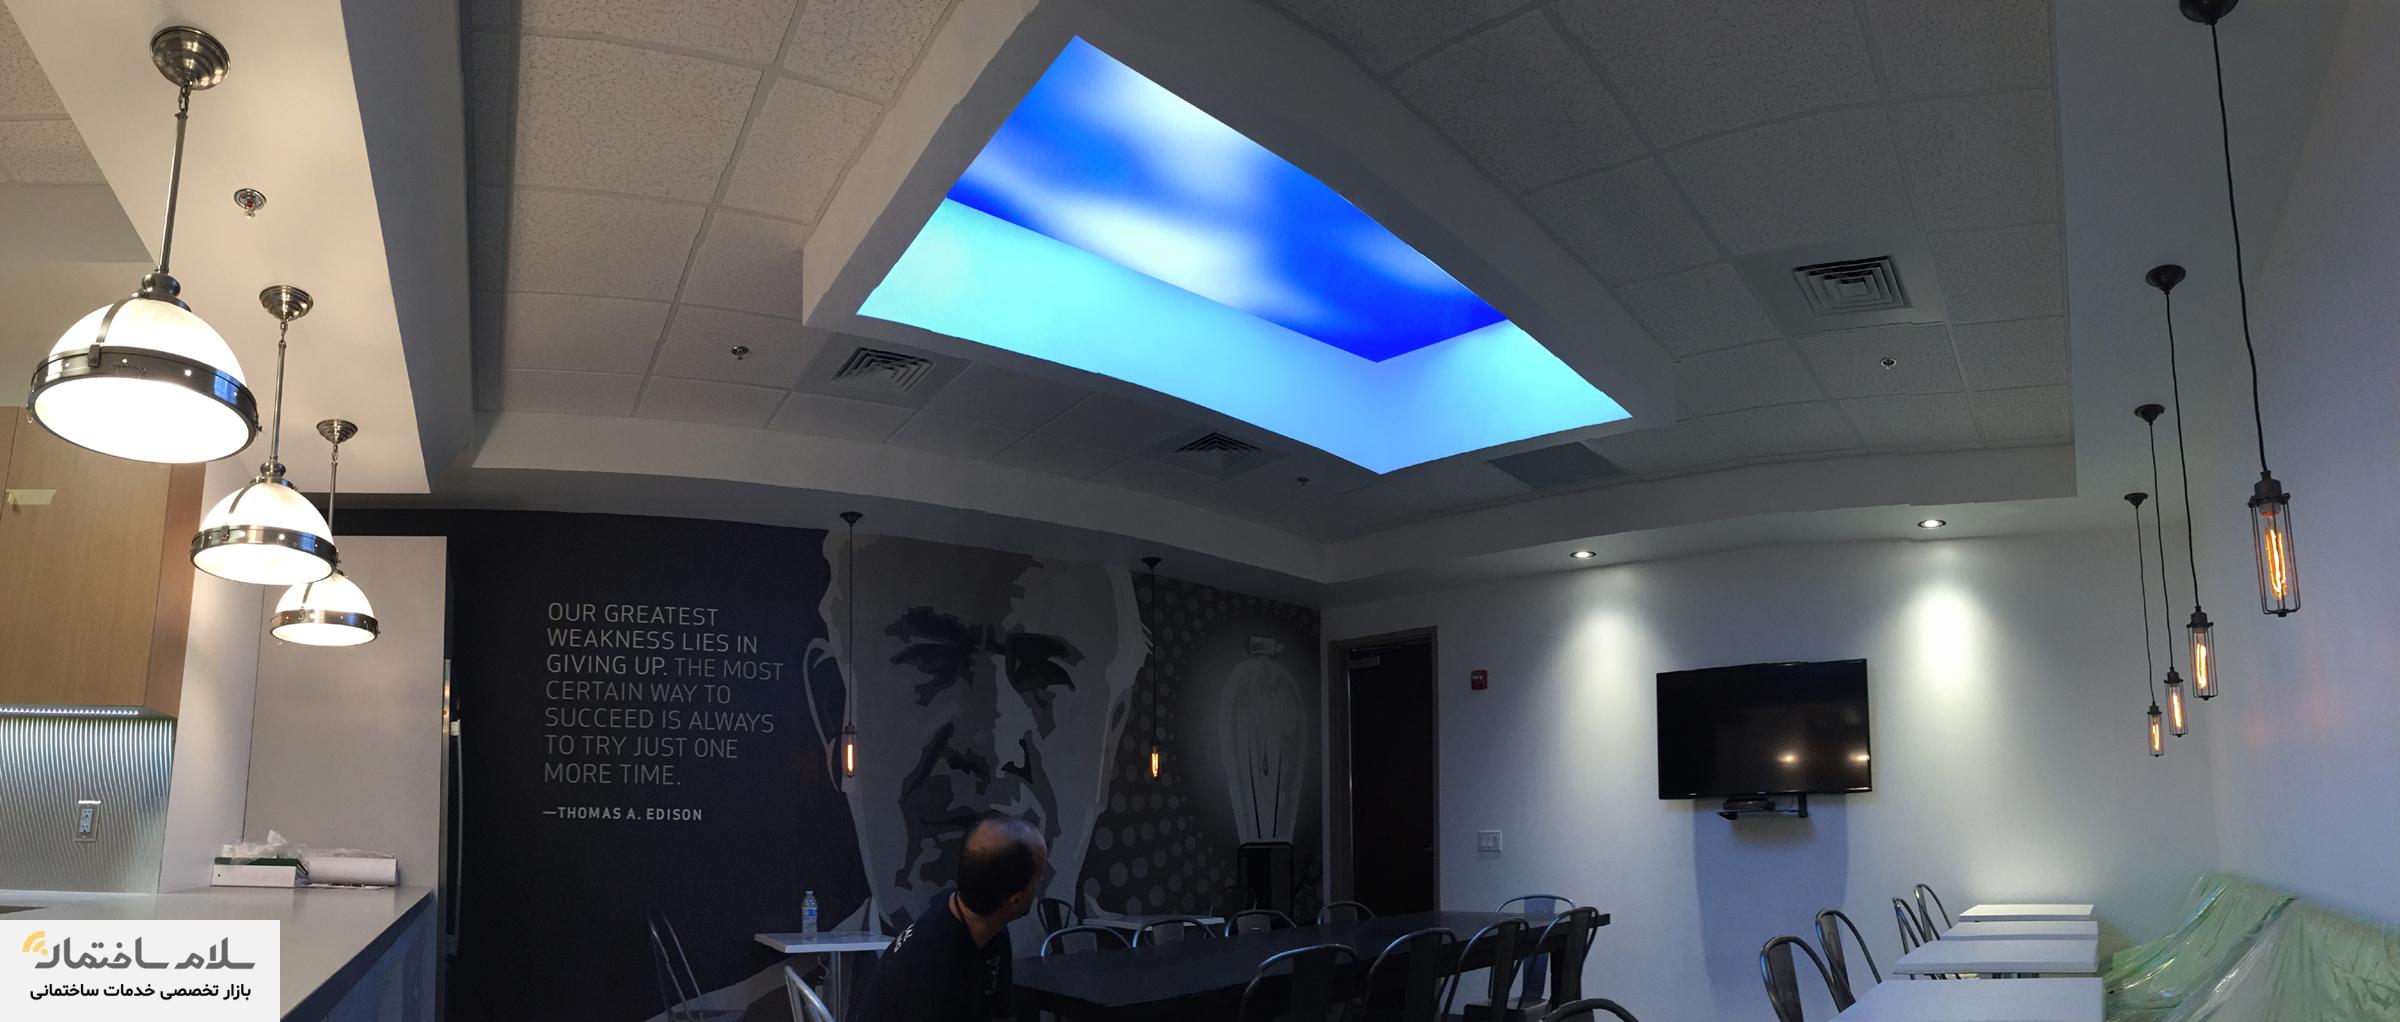 سقف کاذب آسمان مجازی متحرک